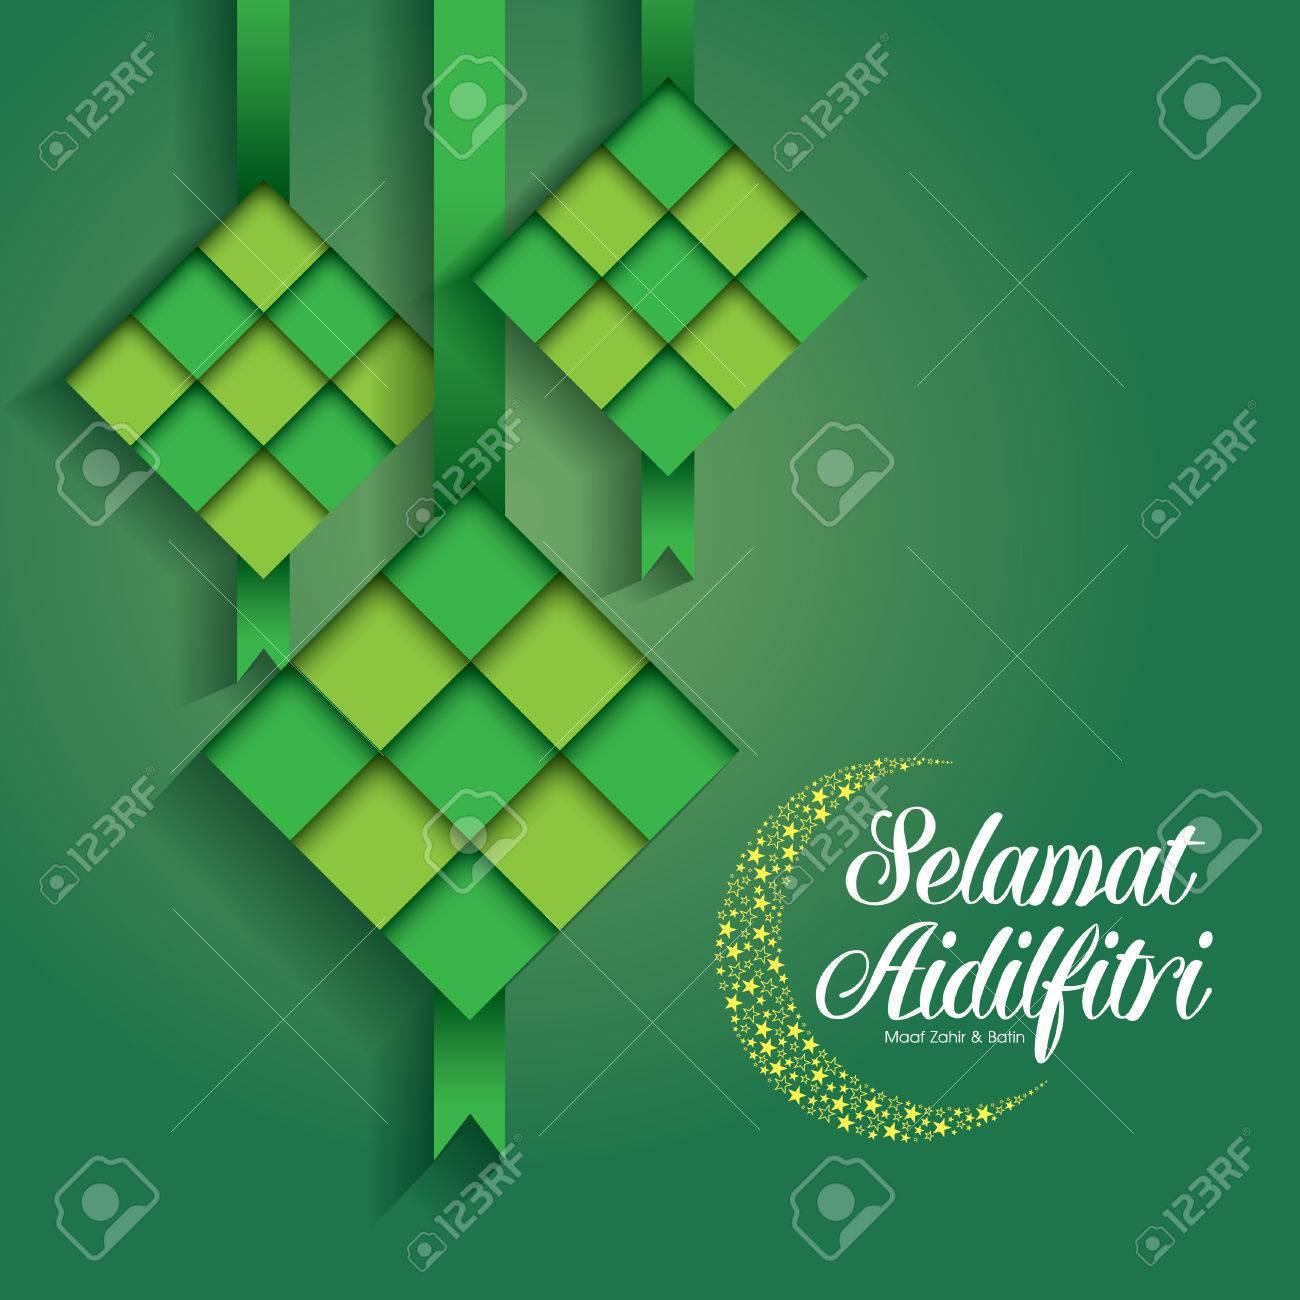 Selamat Hari Raya Aidilfitri vector illustration with traditional malay ketupat. Caption: Fasting Day of Celebration - 80112886